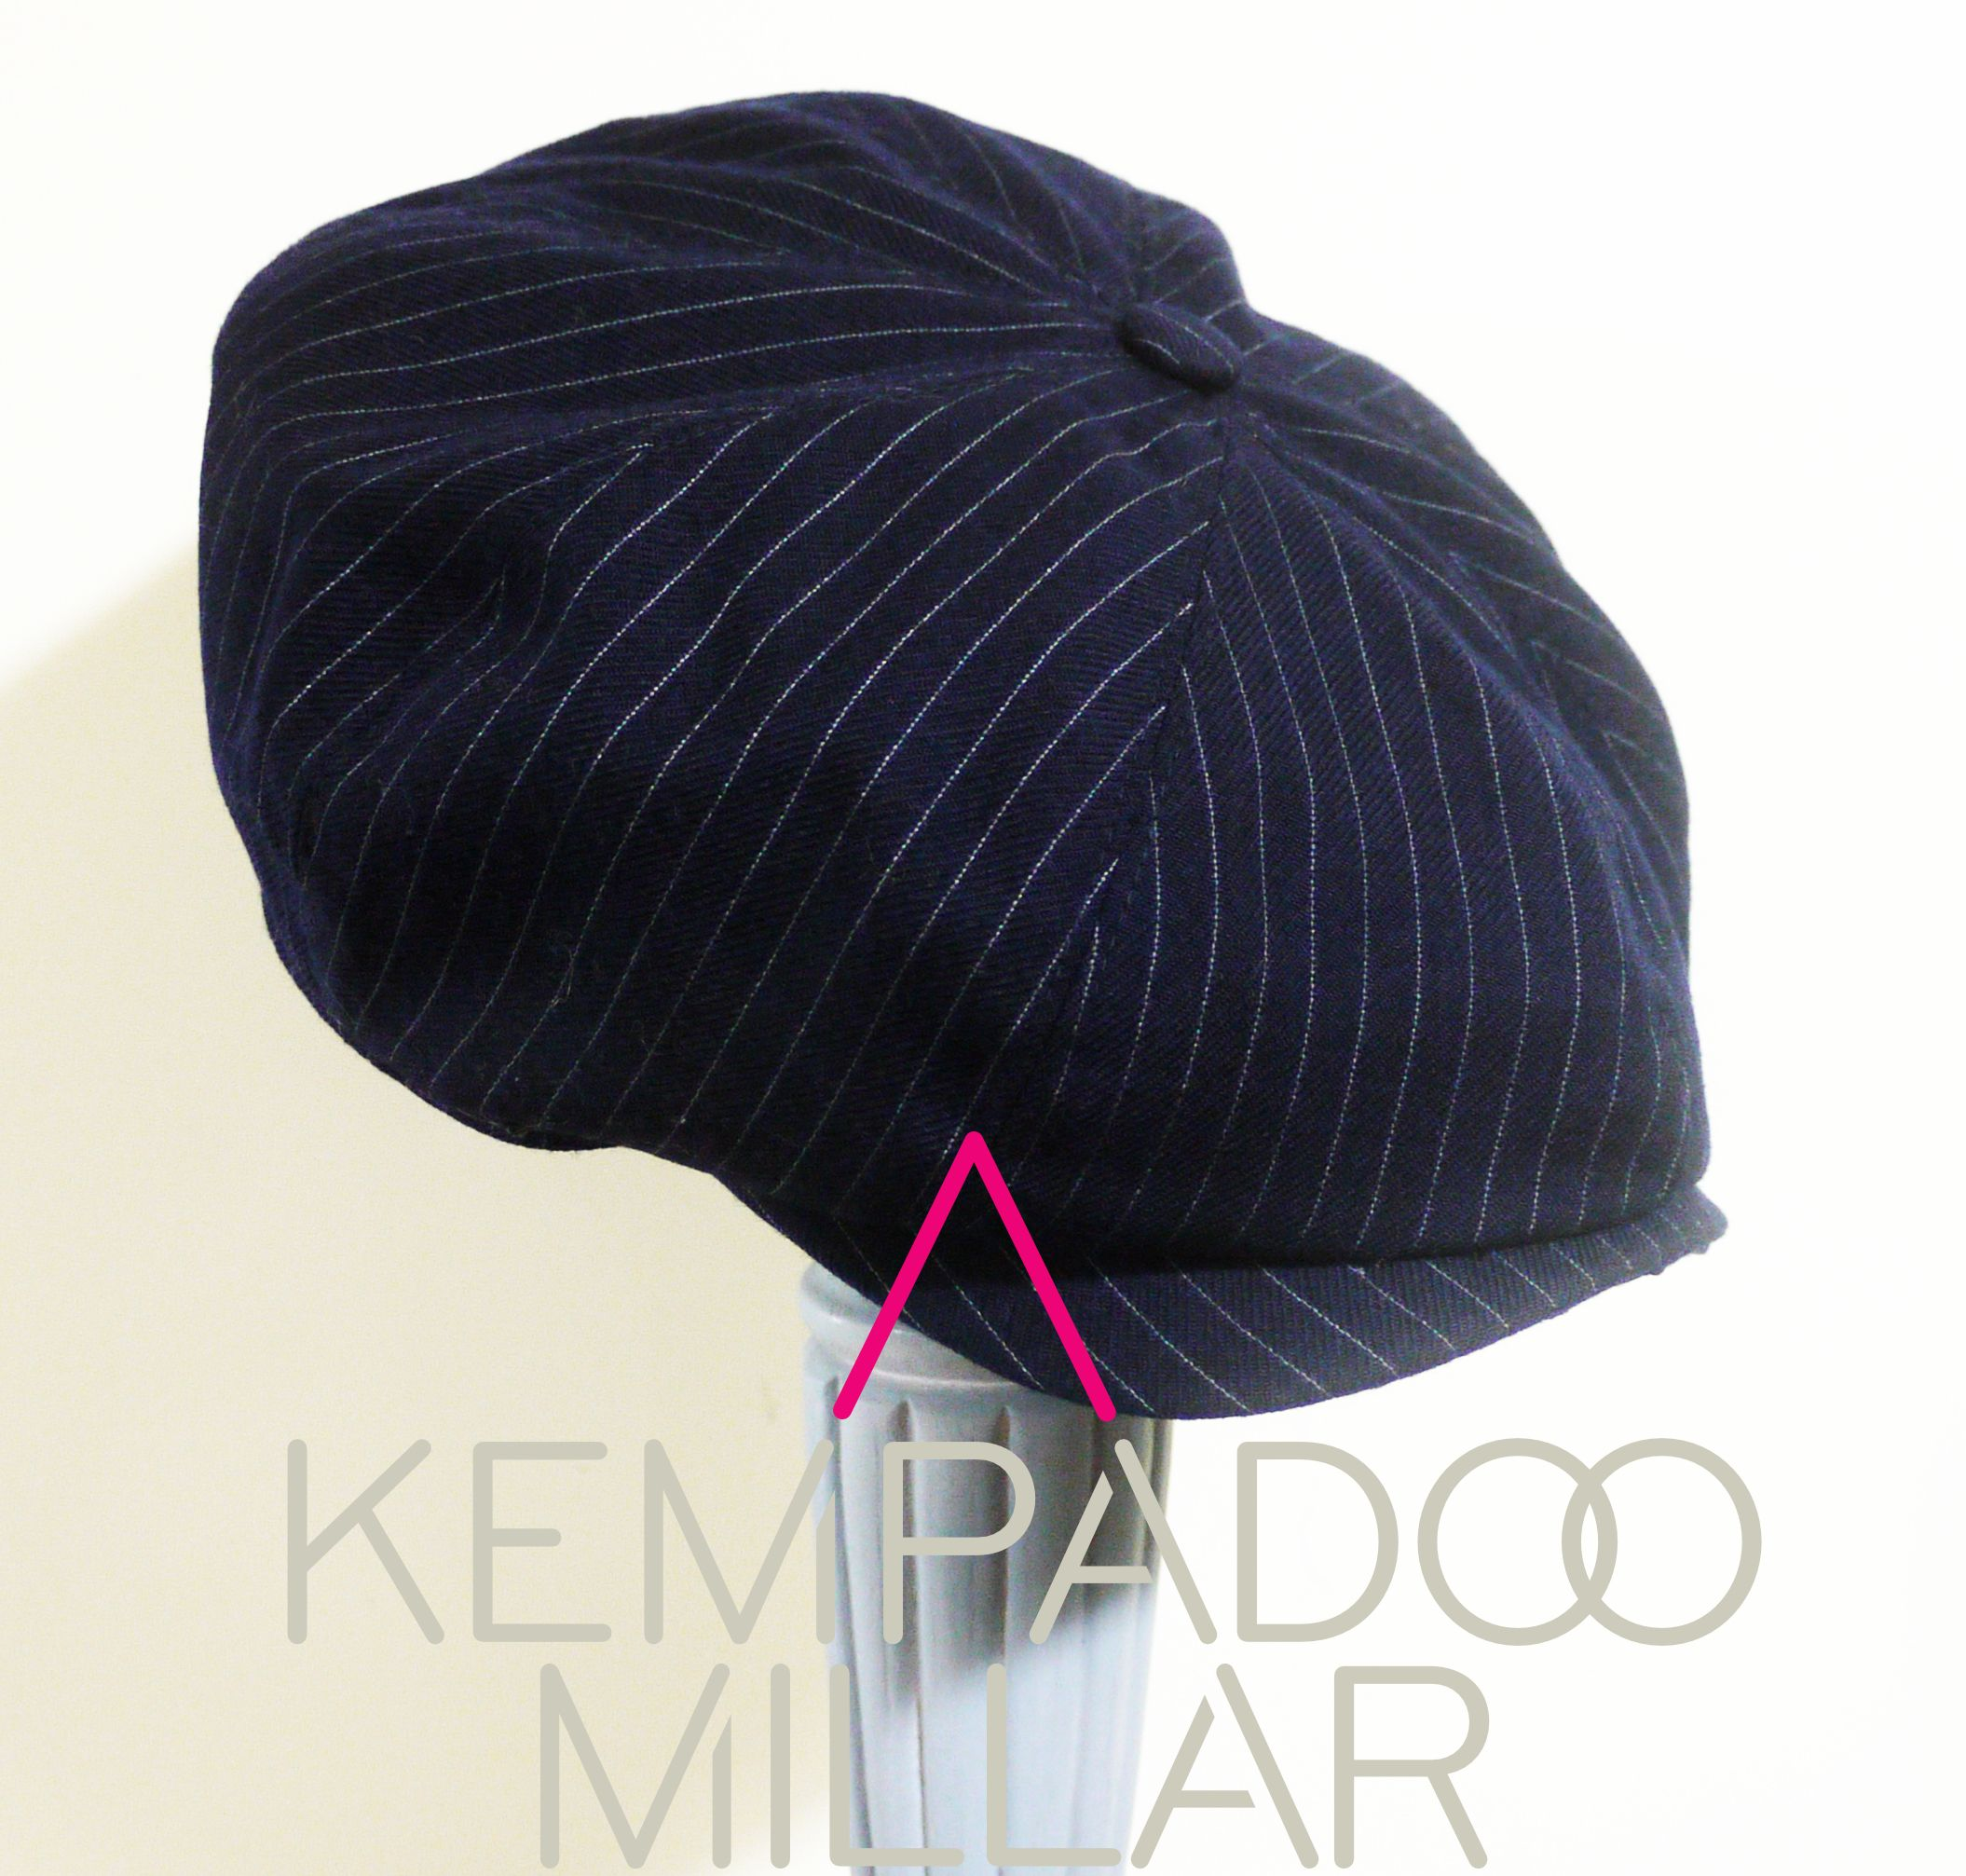 KEMPADOO MILLAR Navy with Silver Pinstripe. Peaky Blinder inspired Bespoke  Baker Boy Cap. Available at www.kempadoo.com. BRITISH MENS ACCESSORIES 94b02768620